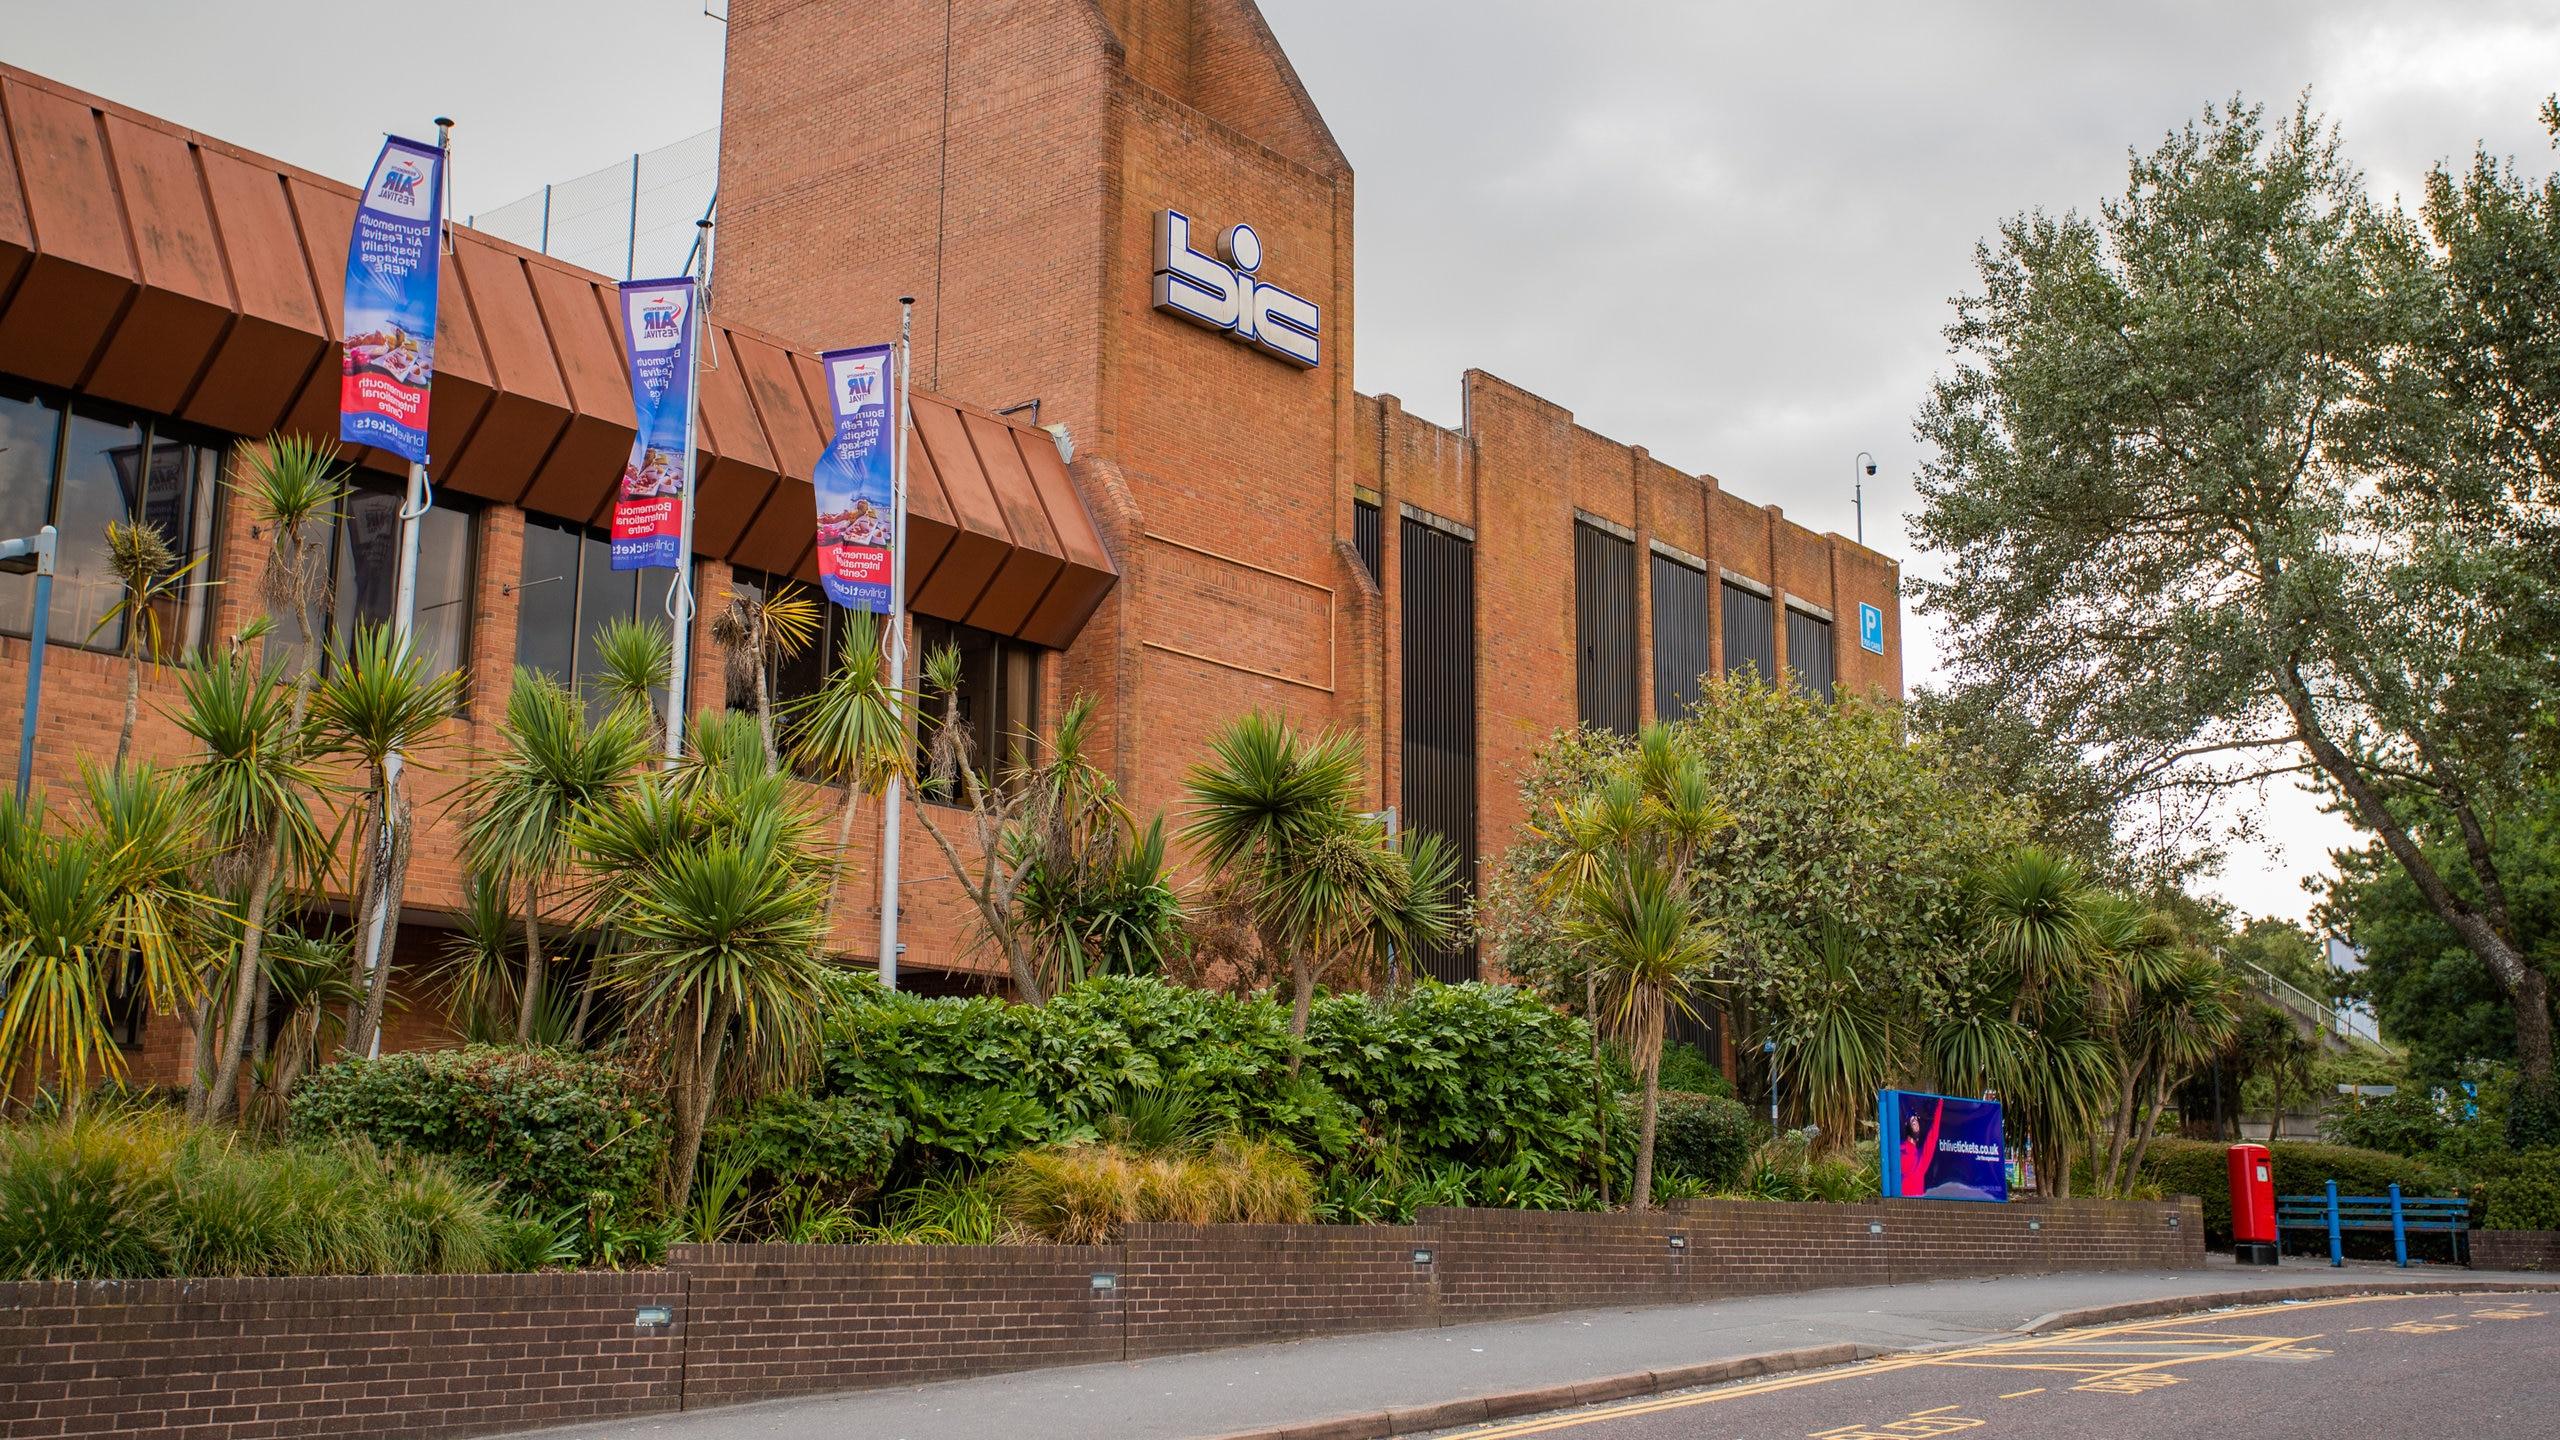 Bournemouth International Centre, Bournemouth, England, United Kingdom